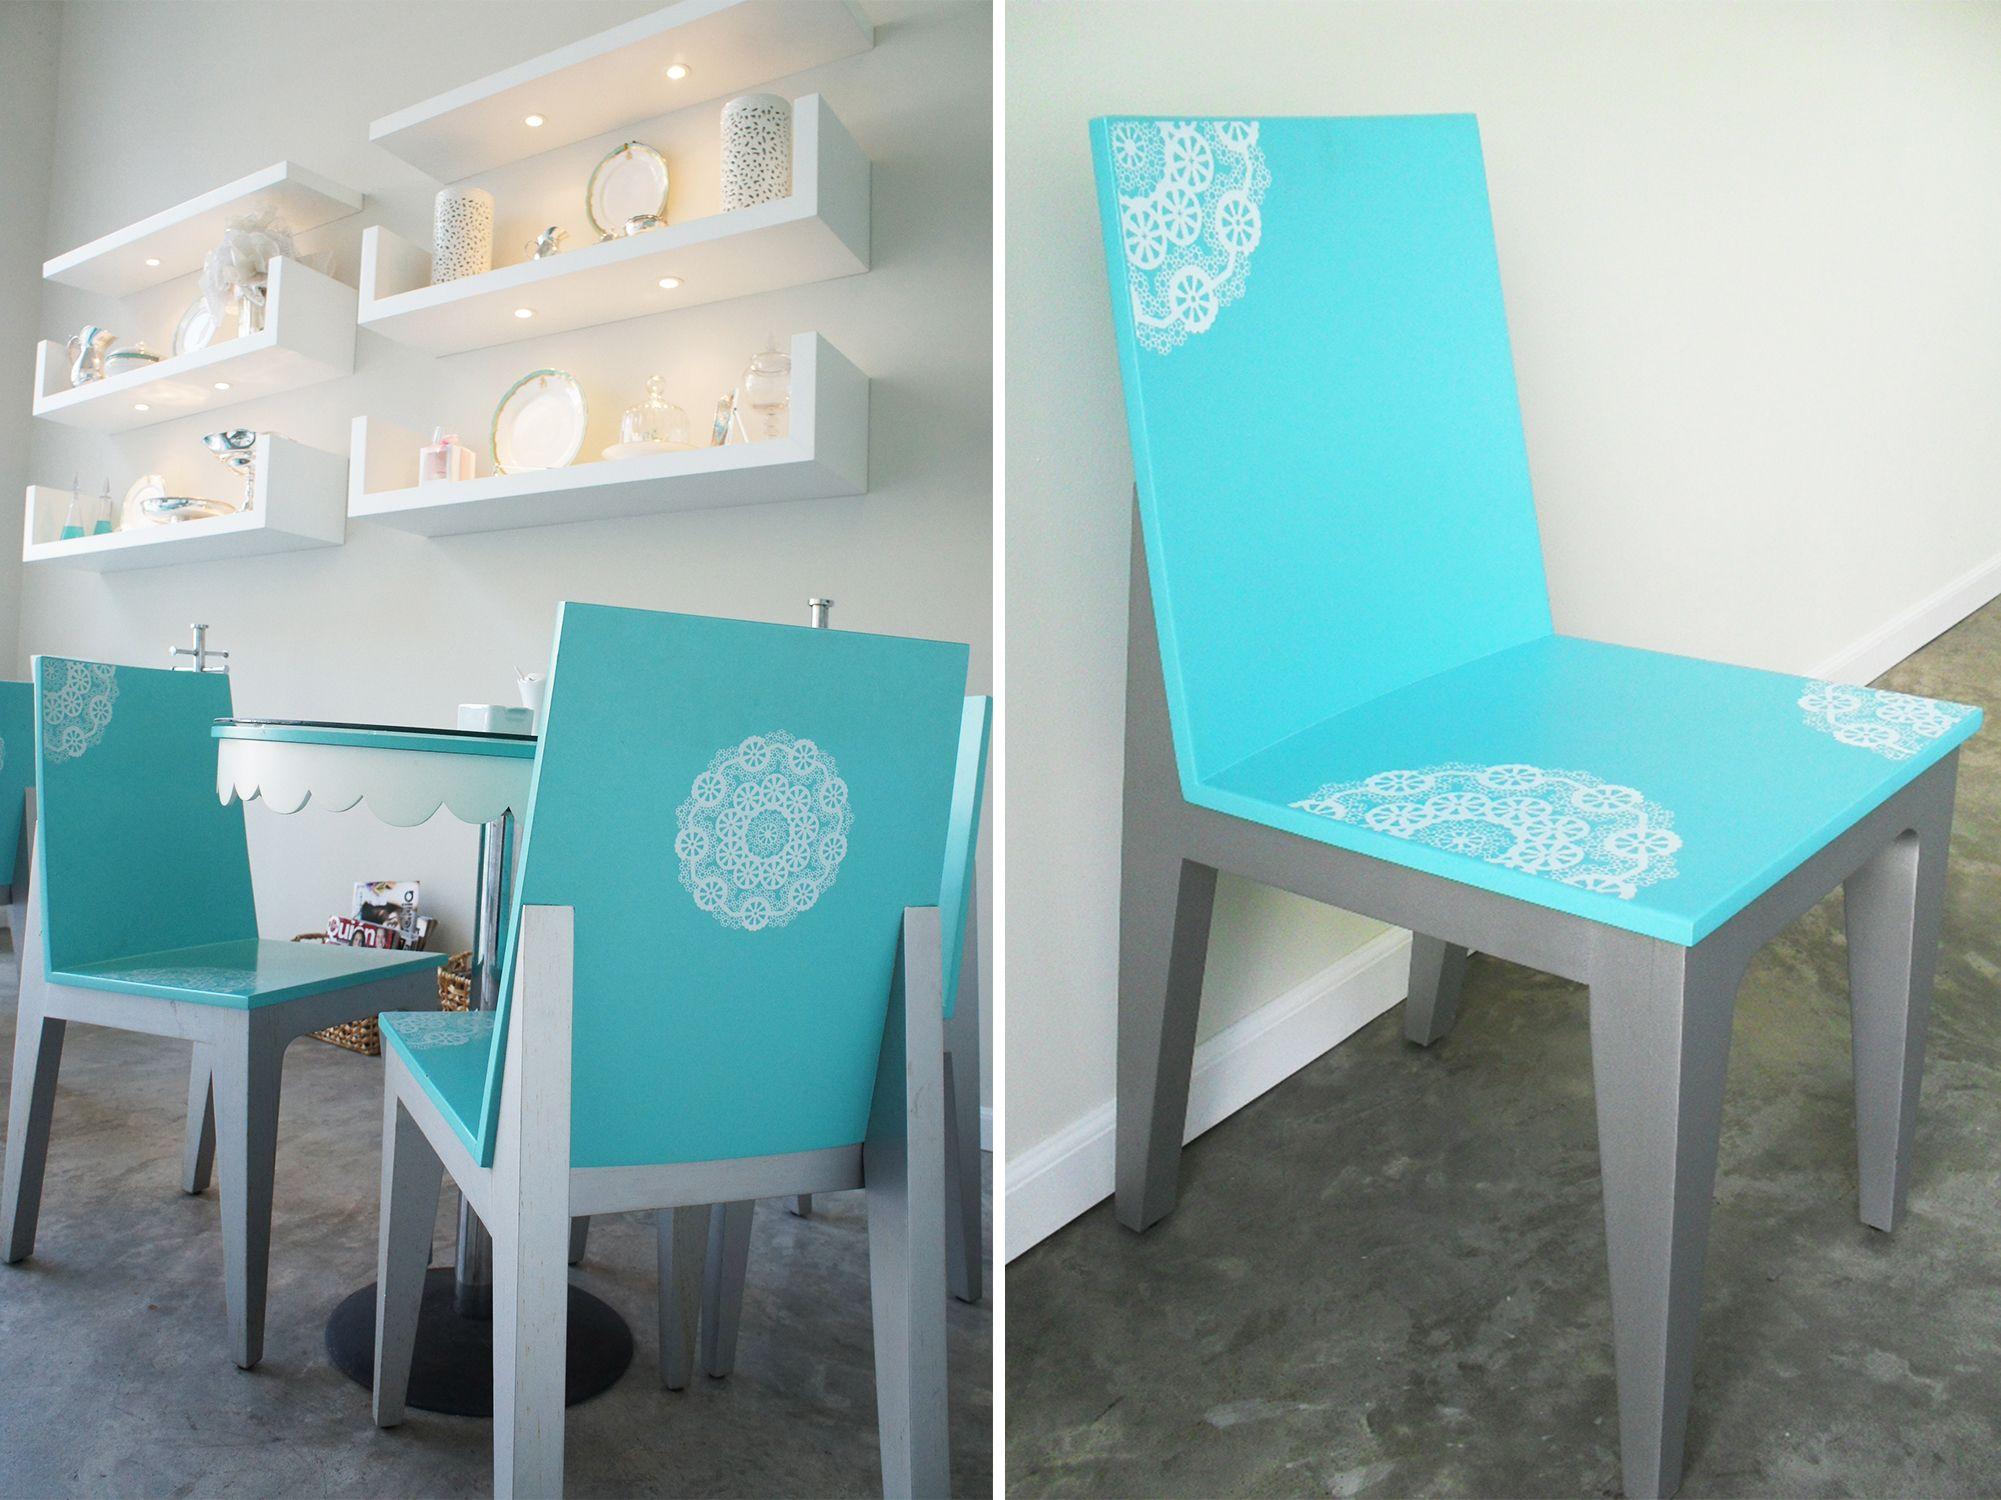 Interior Pasteler A Muebles Para Pasteler A La Dulce Acapulco  # Muebles Turquesa